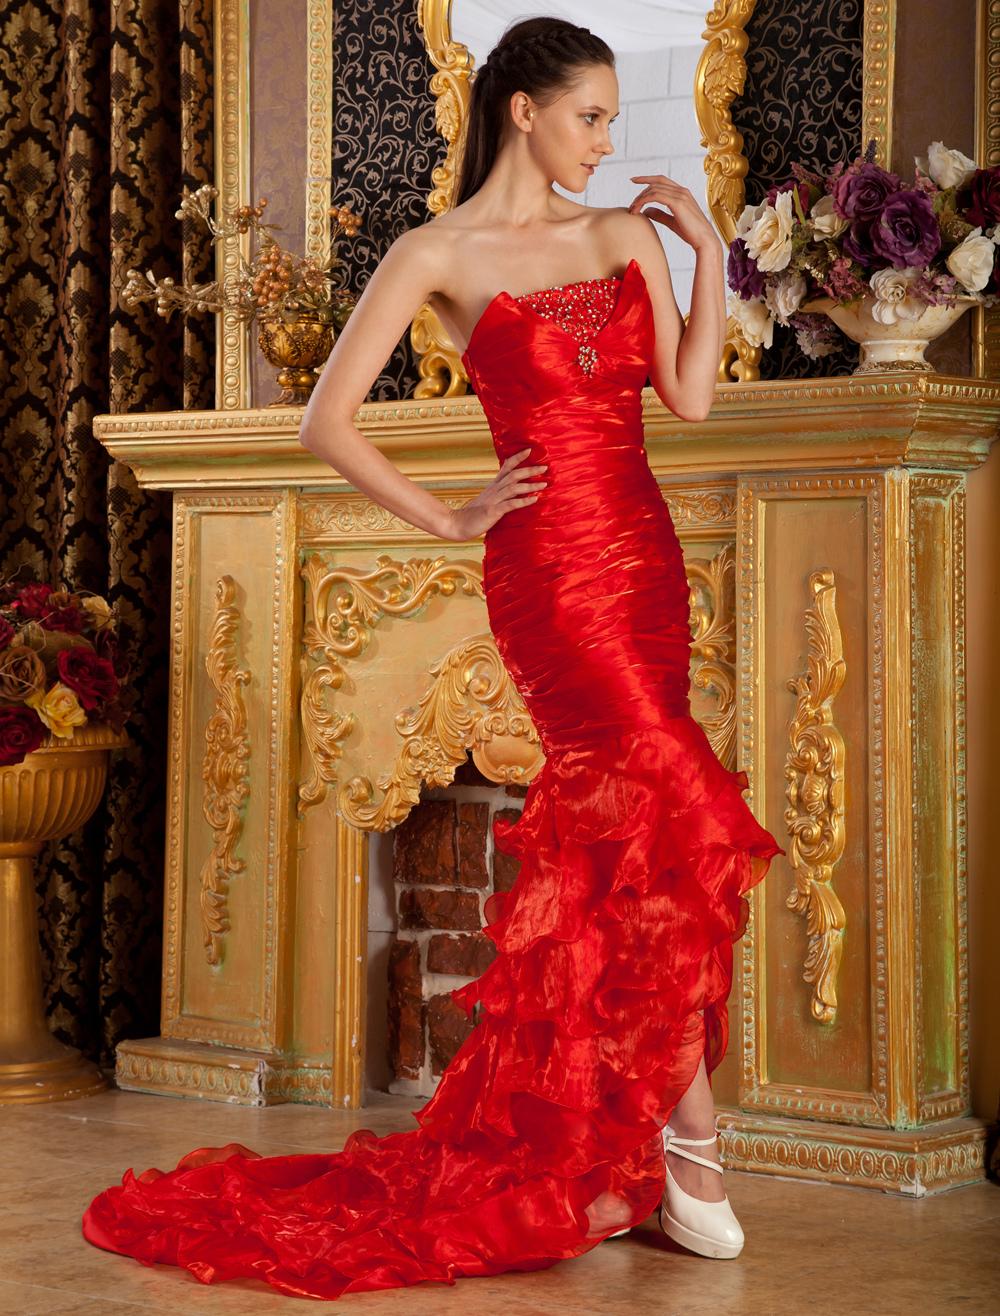 Red Strapless Mermaid Trumpet Beading Tulle Evening Dress (Wedding Evening Dresses) photo